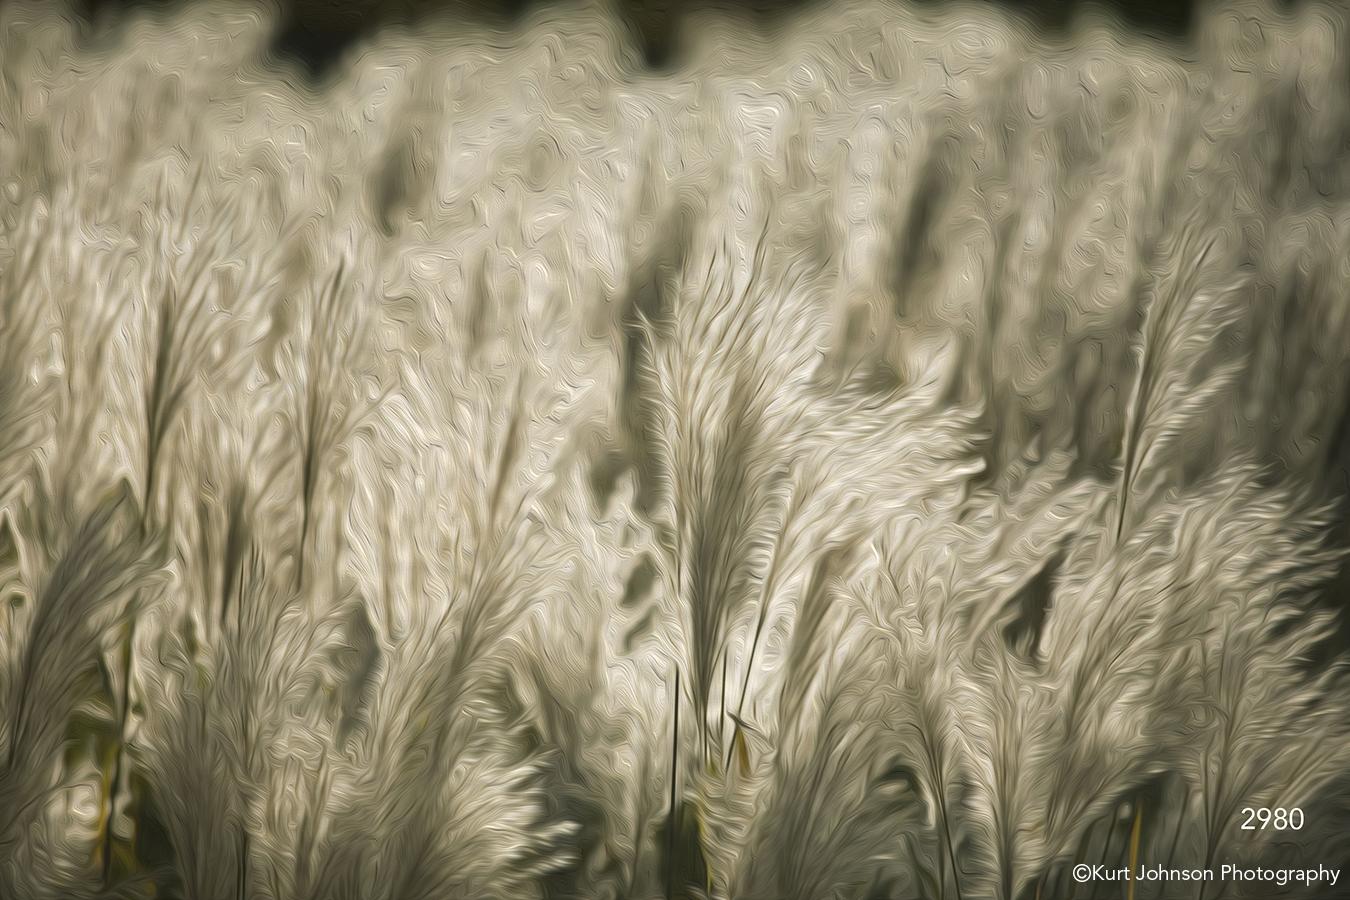 interpretations interpretation filter oil paint grasses white texture